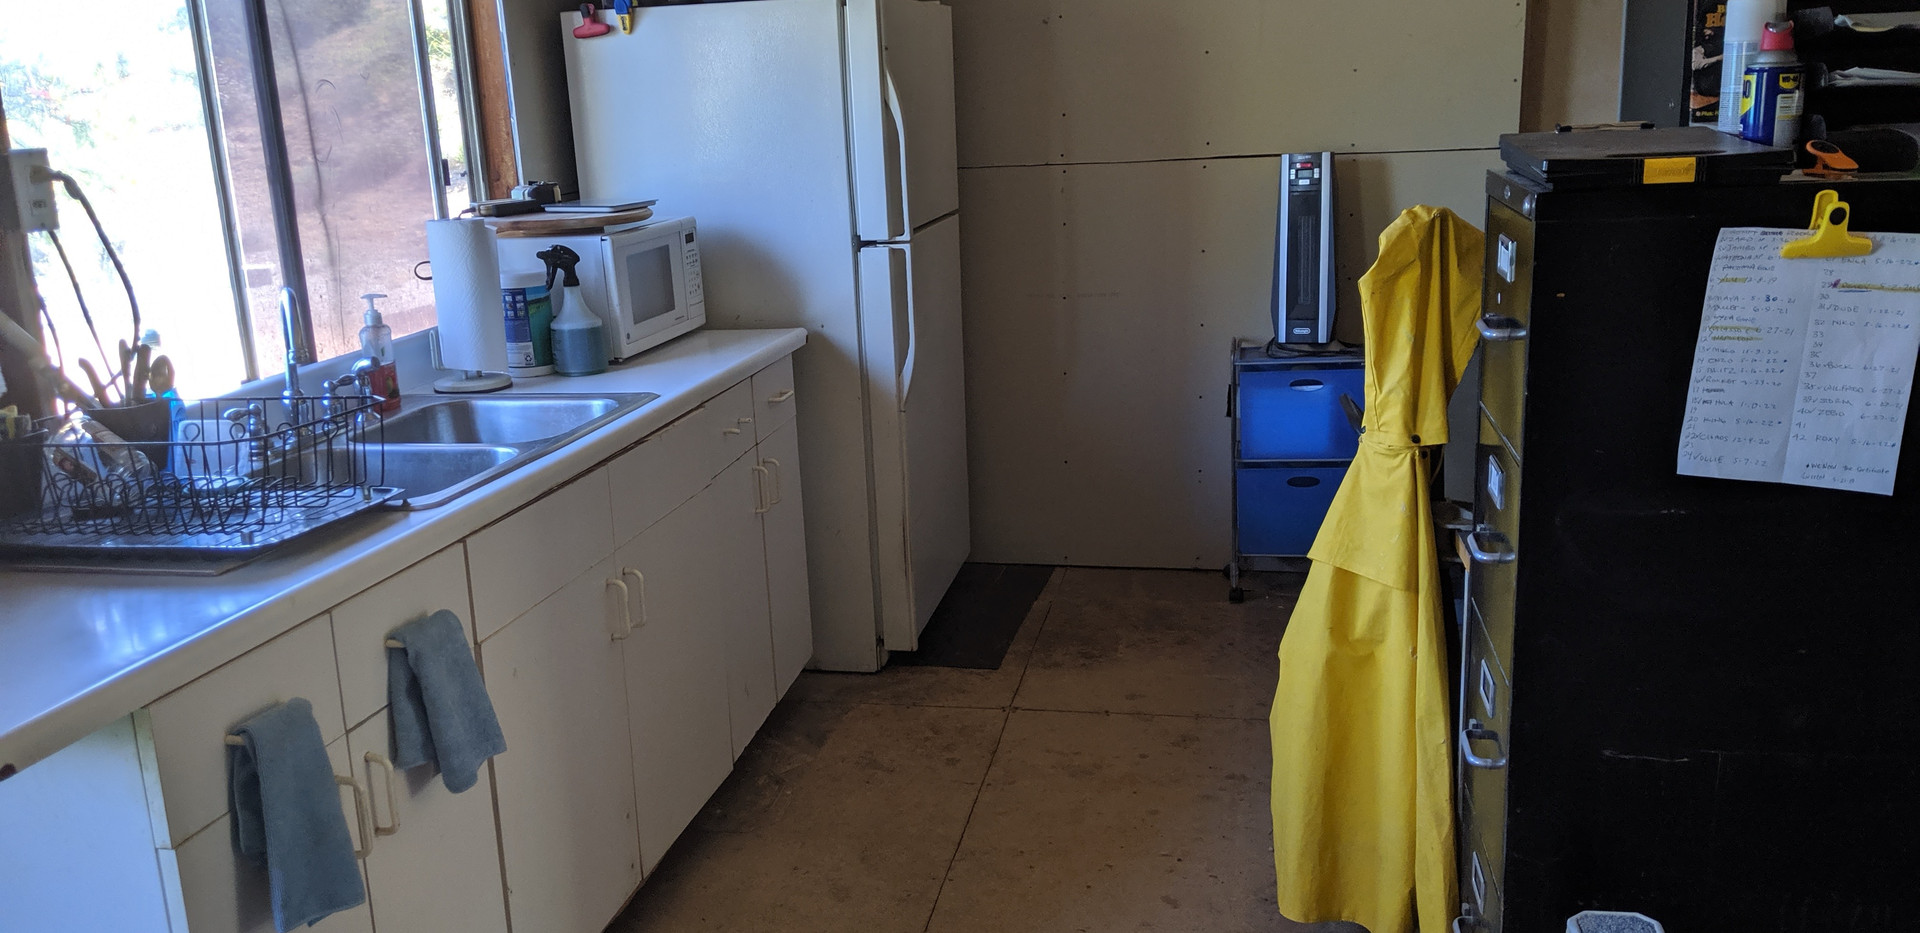 Main feed room kitchen